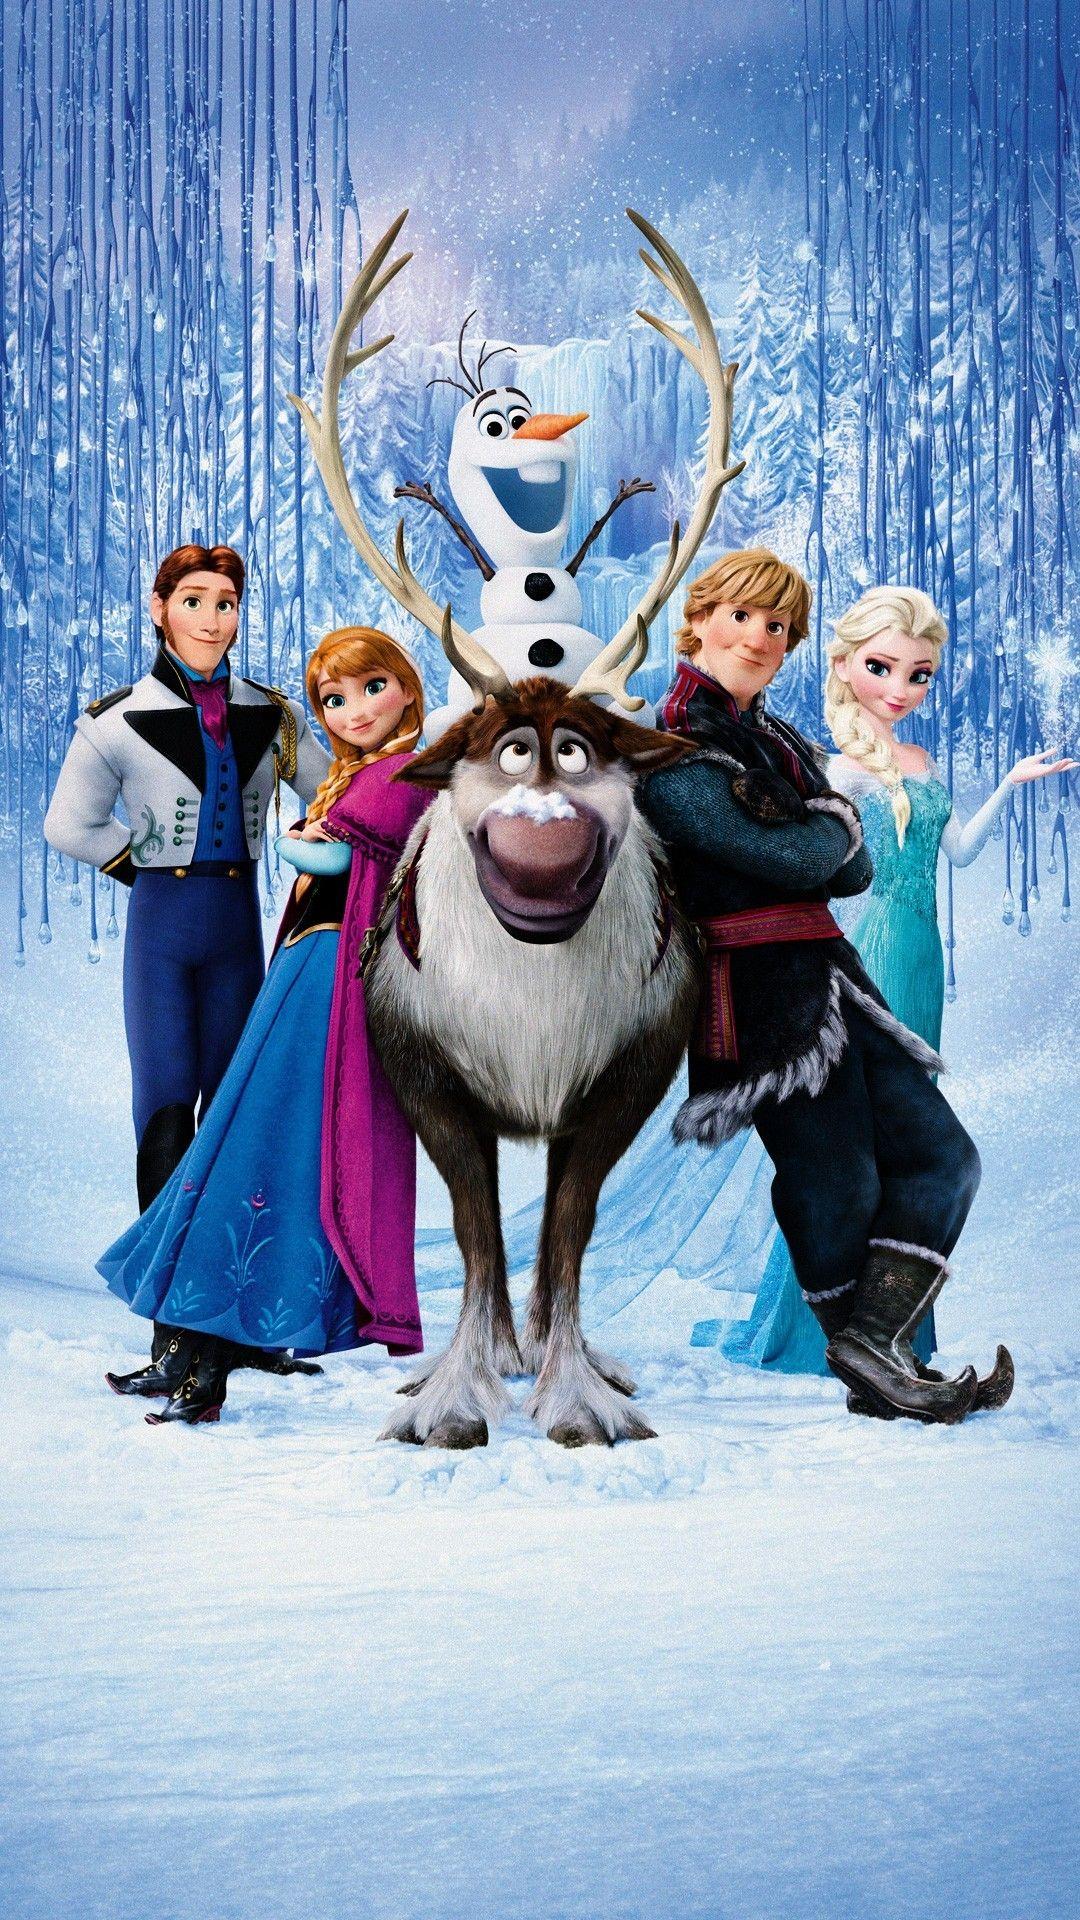 Frozen Mobile Wallpaper 2865 Disney movie posters